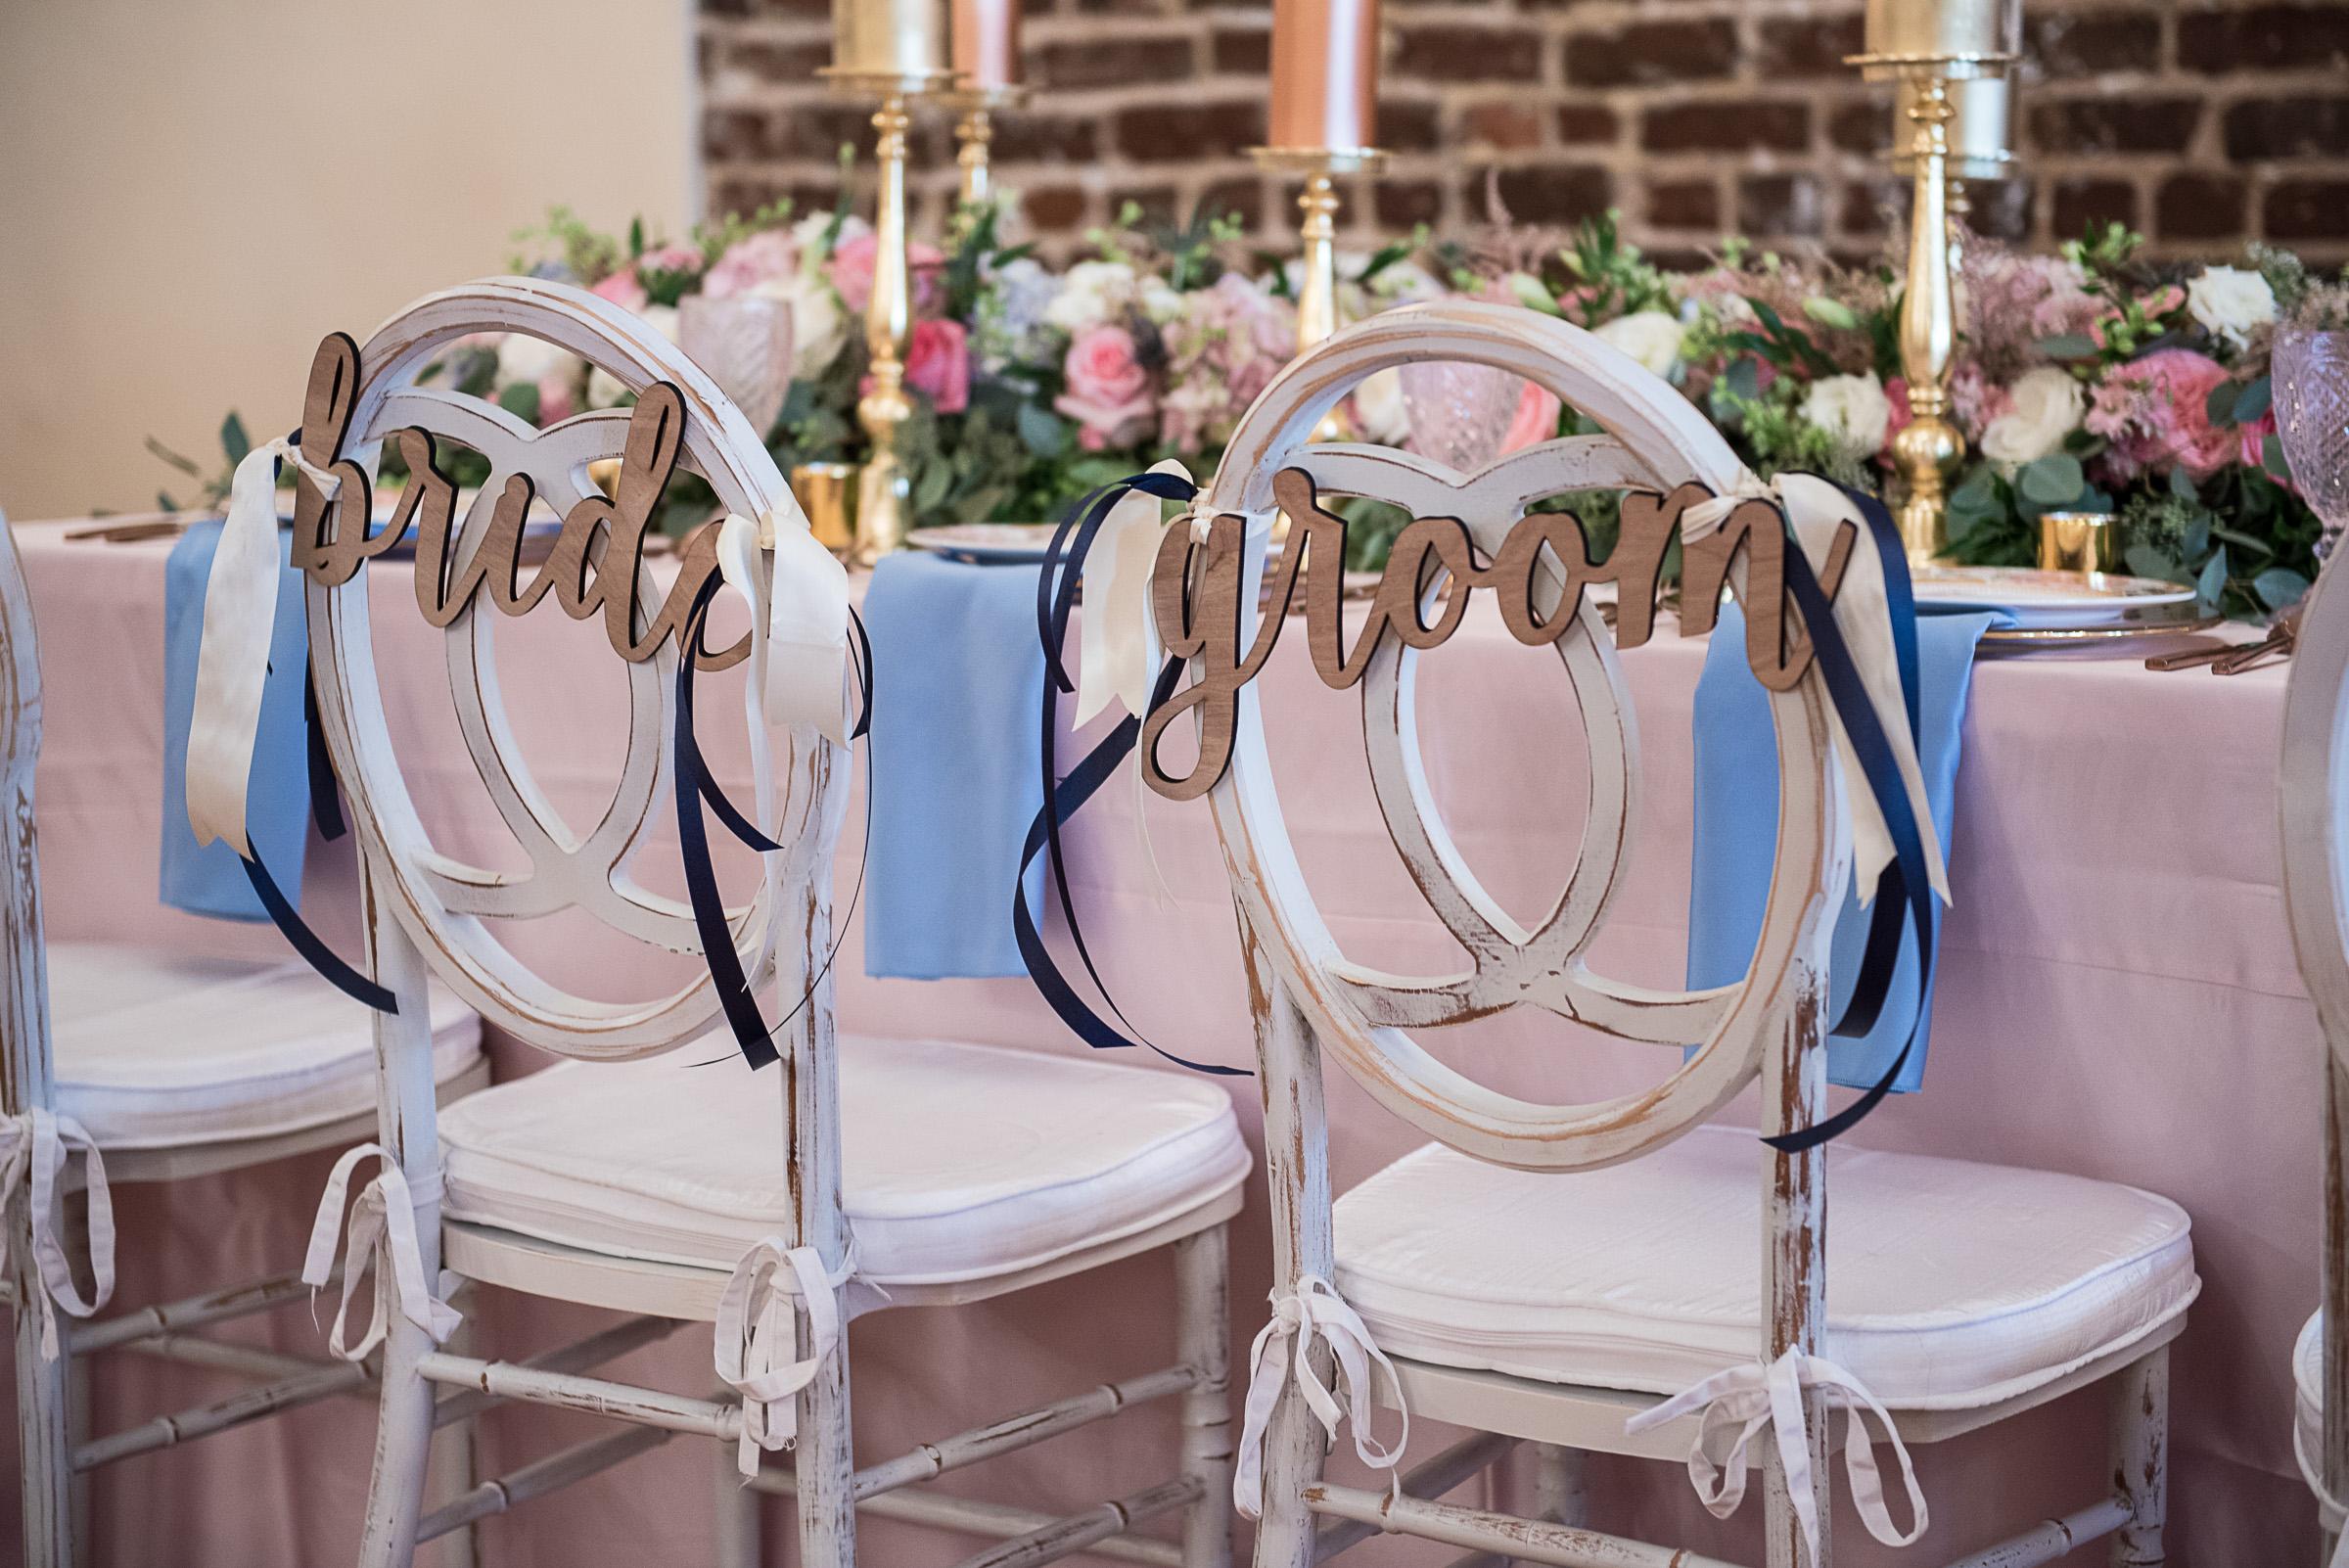 Charleston wedding chairs from Eventworks Rentals